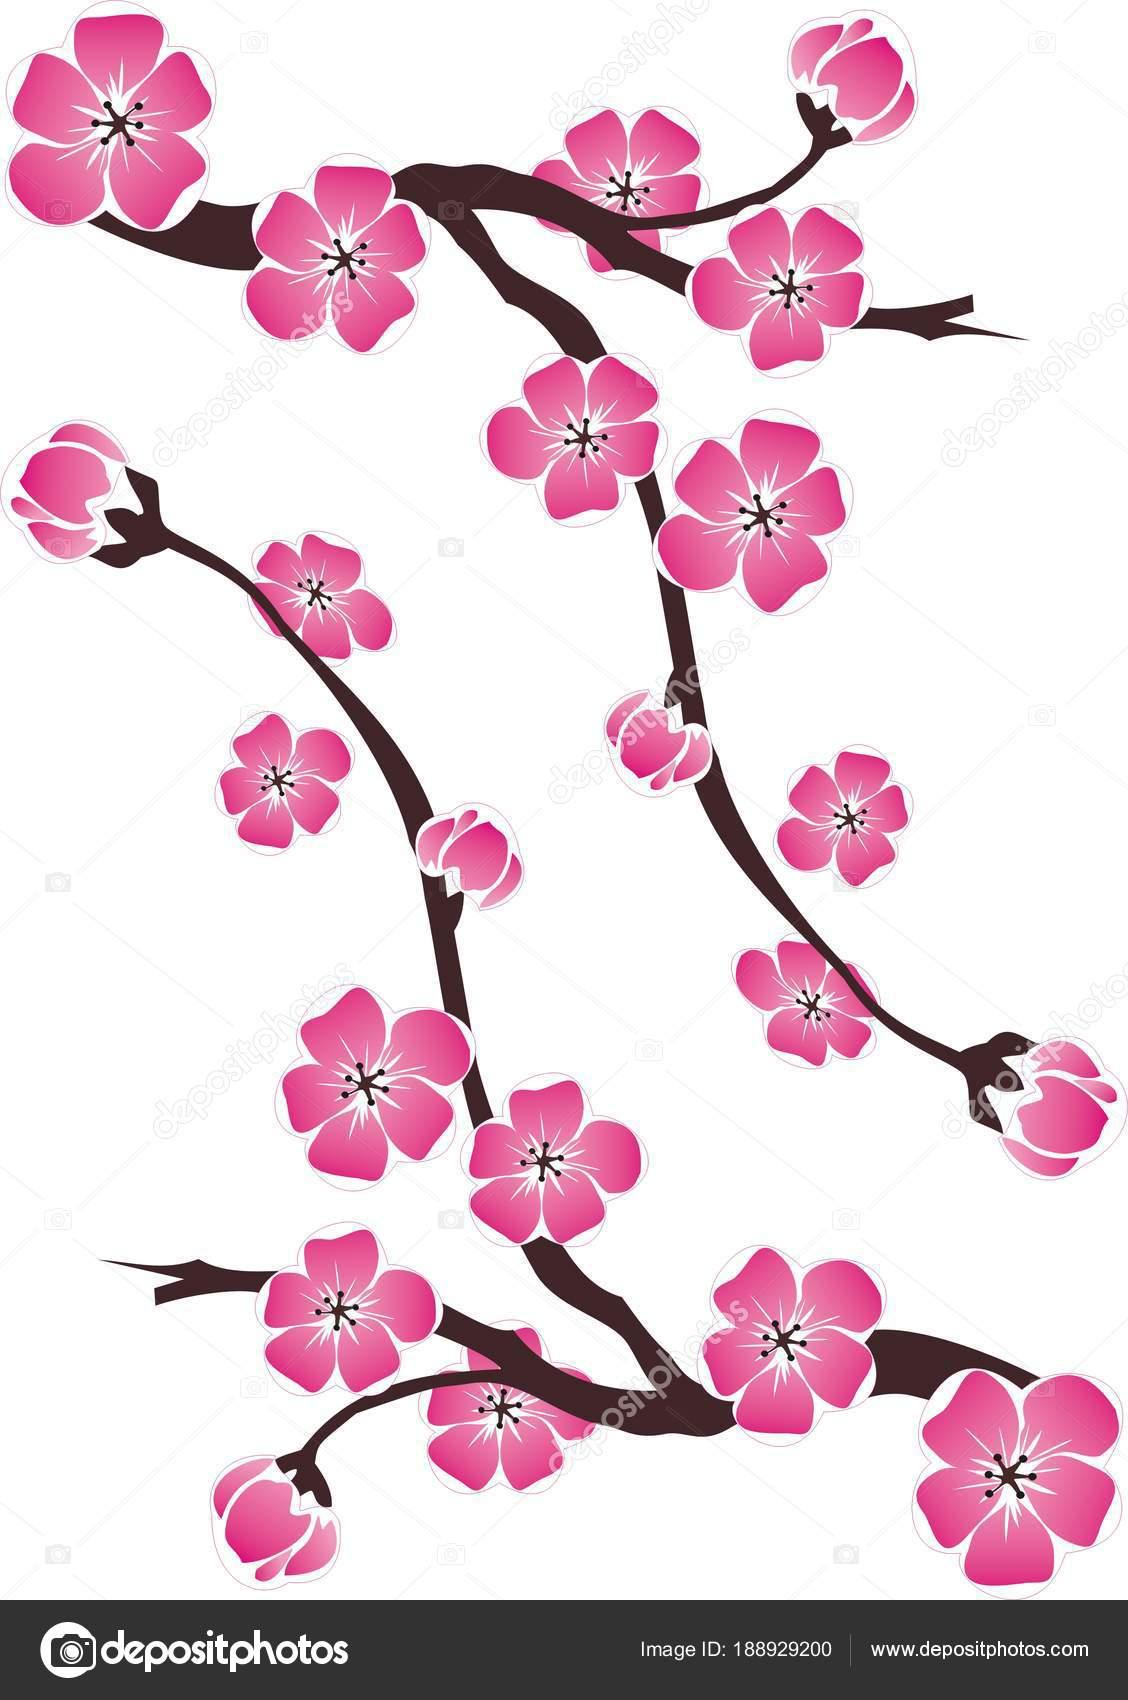 Dibujos Flor De Cerezo Rama Flores Cerezo Sobre Fondo Blanco